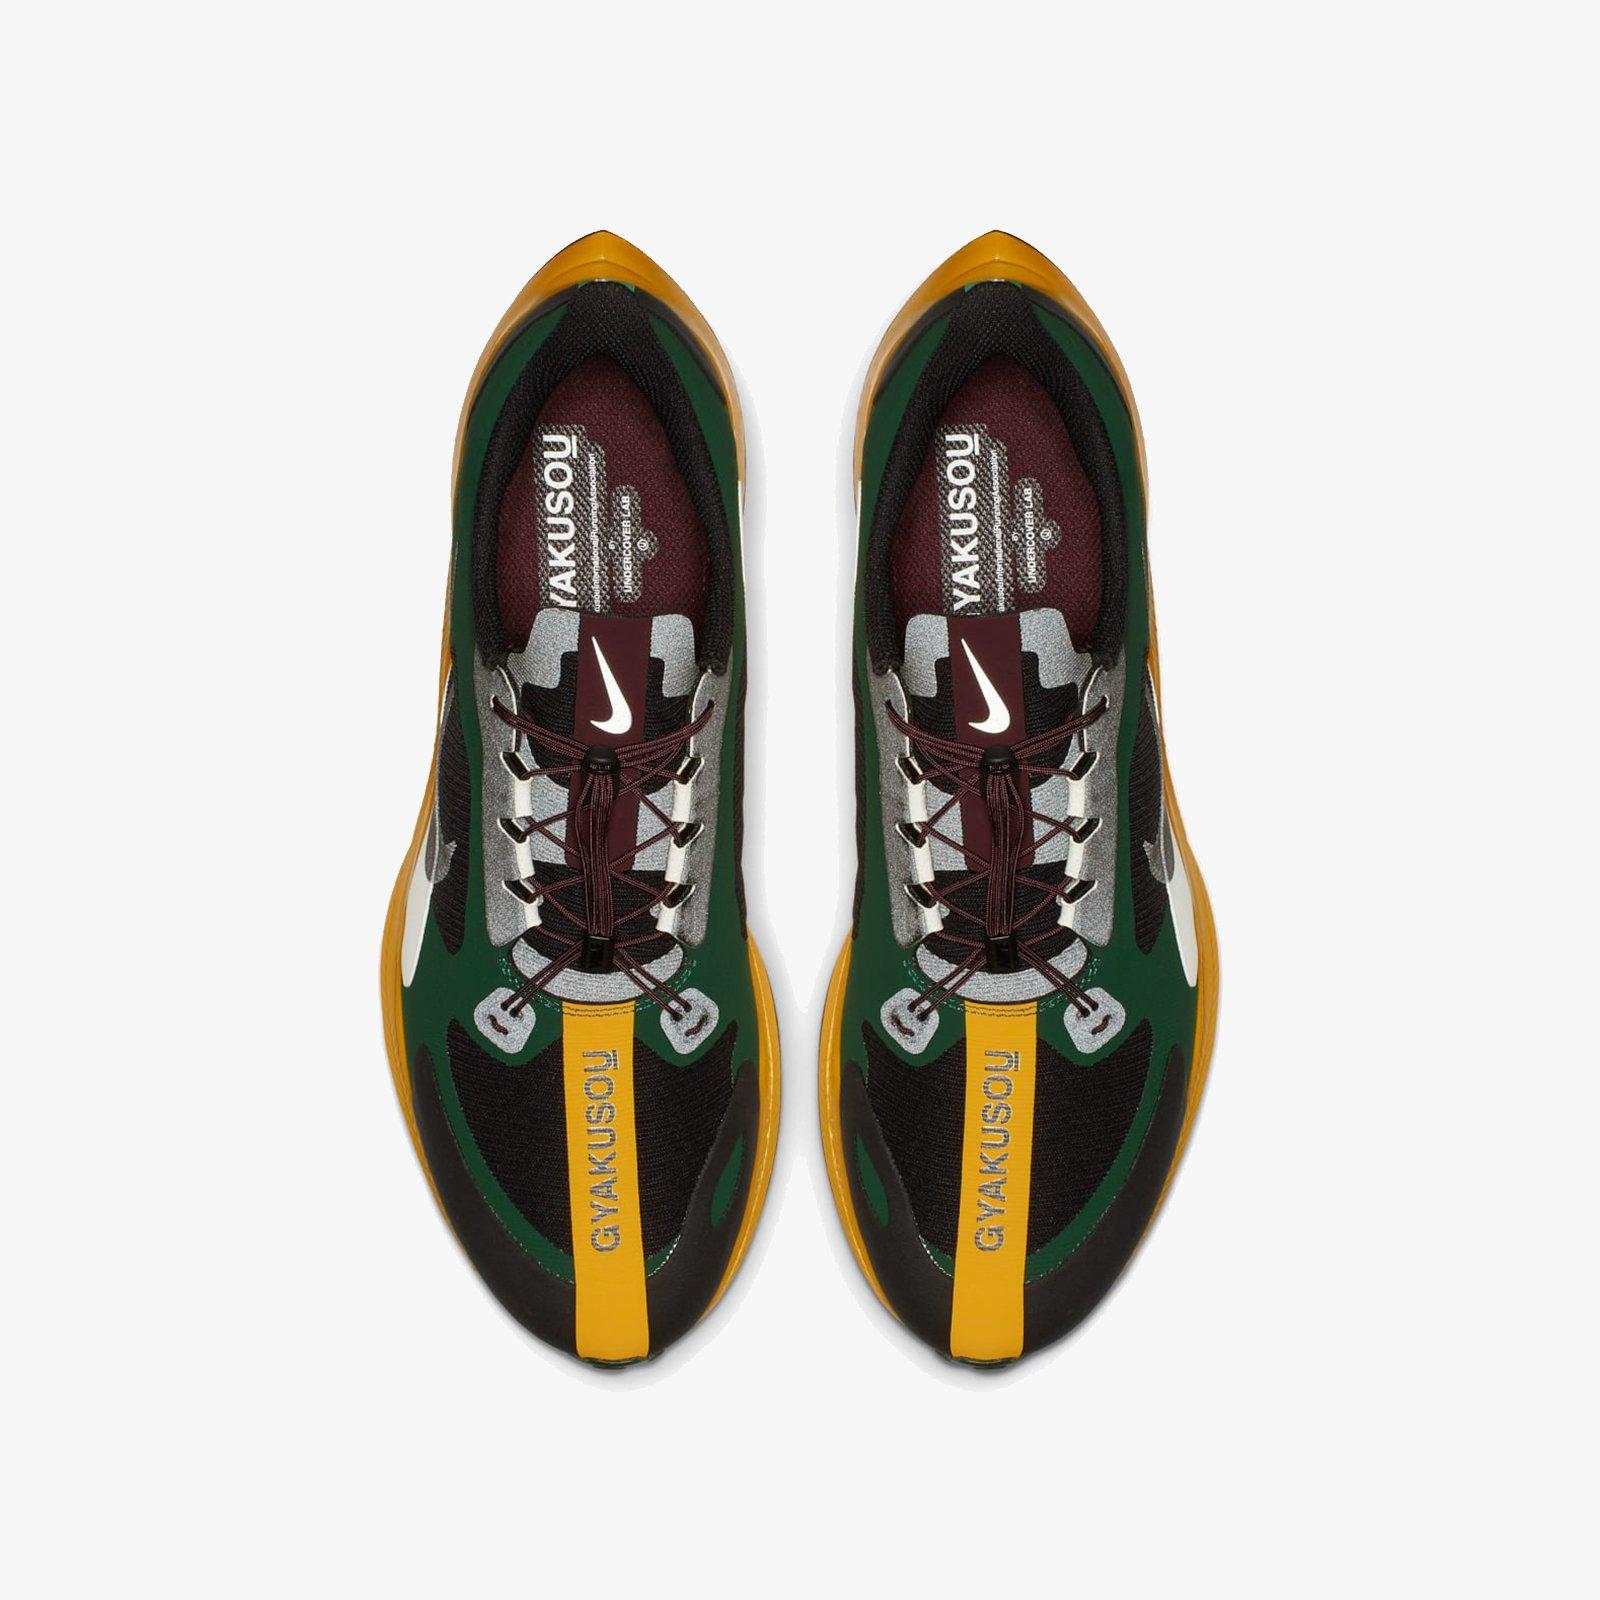 67f8b798e5569 Nike Zoom Pegasus 35 Turbo x Gyakusou - Bq0579-300 - Sneakersnstuff ...